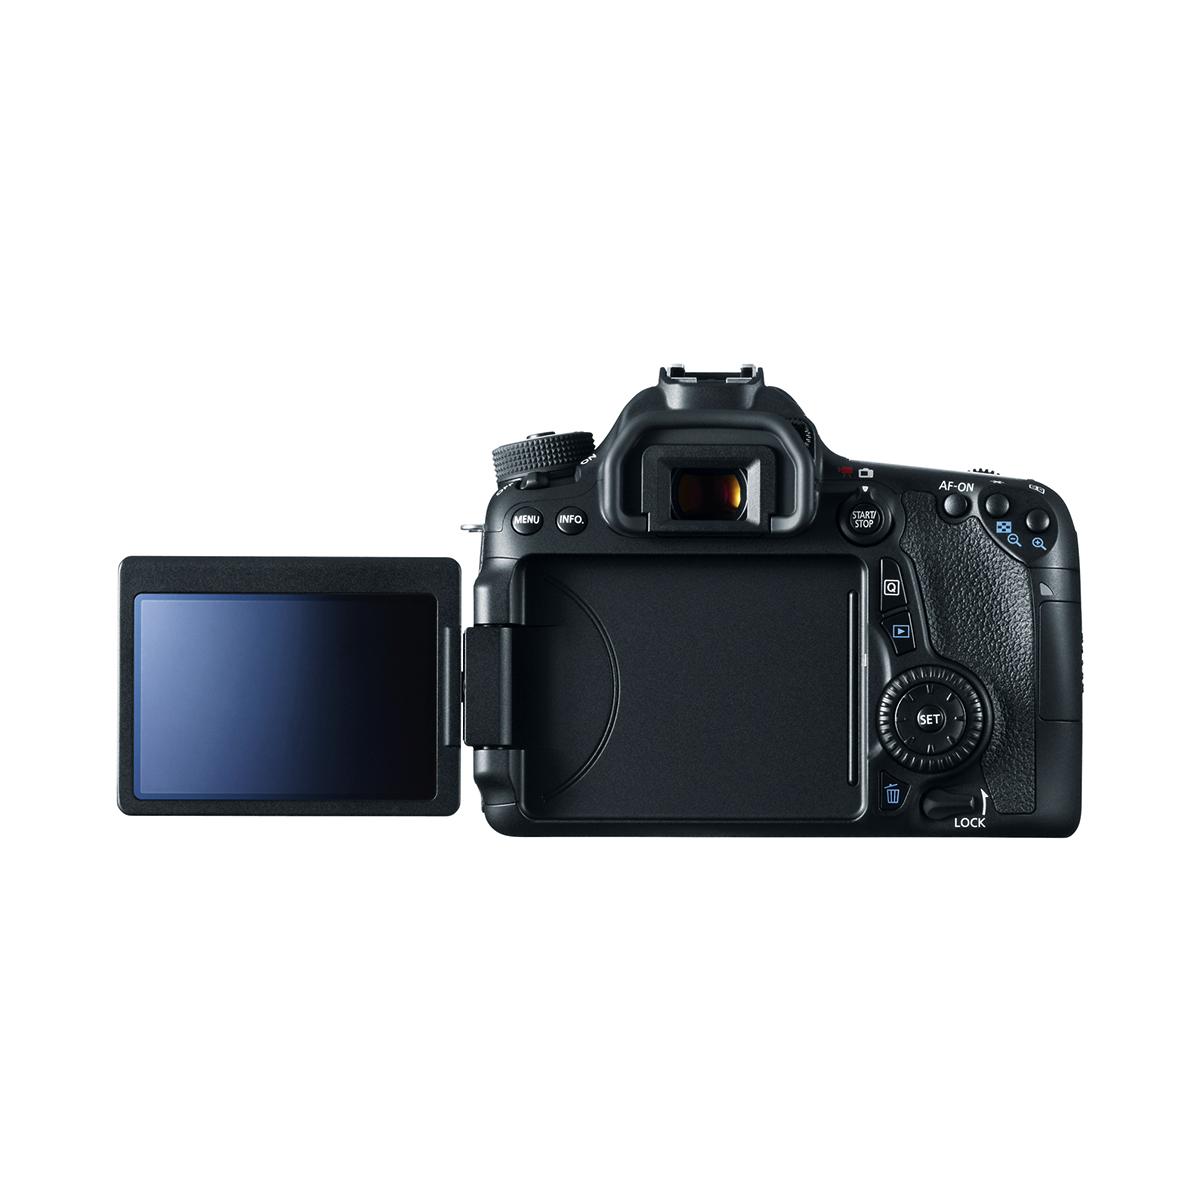 Canon EOS 70D DSLR Body w/ Battery Grip – The Camera Exchange, Inc.